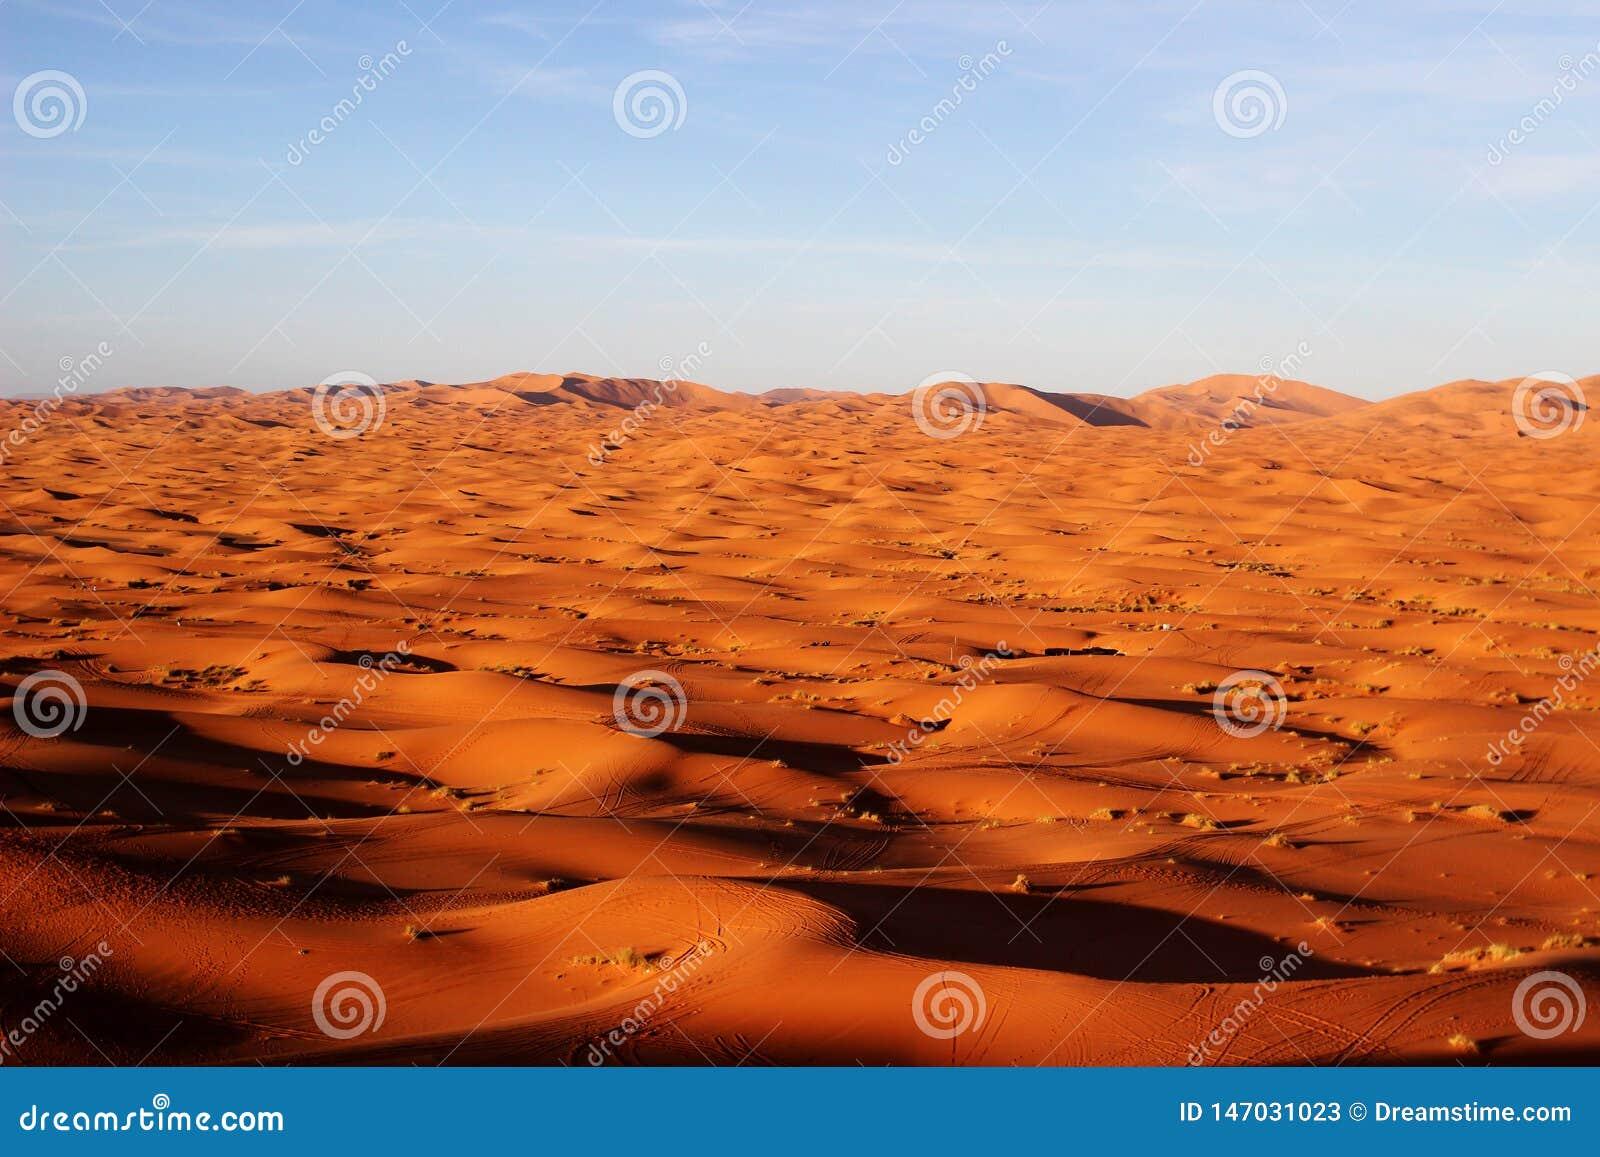 A piece of sahara desert